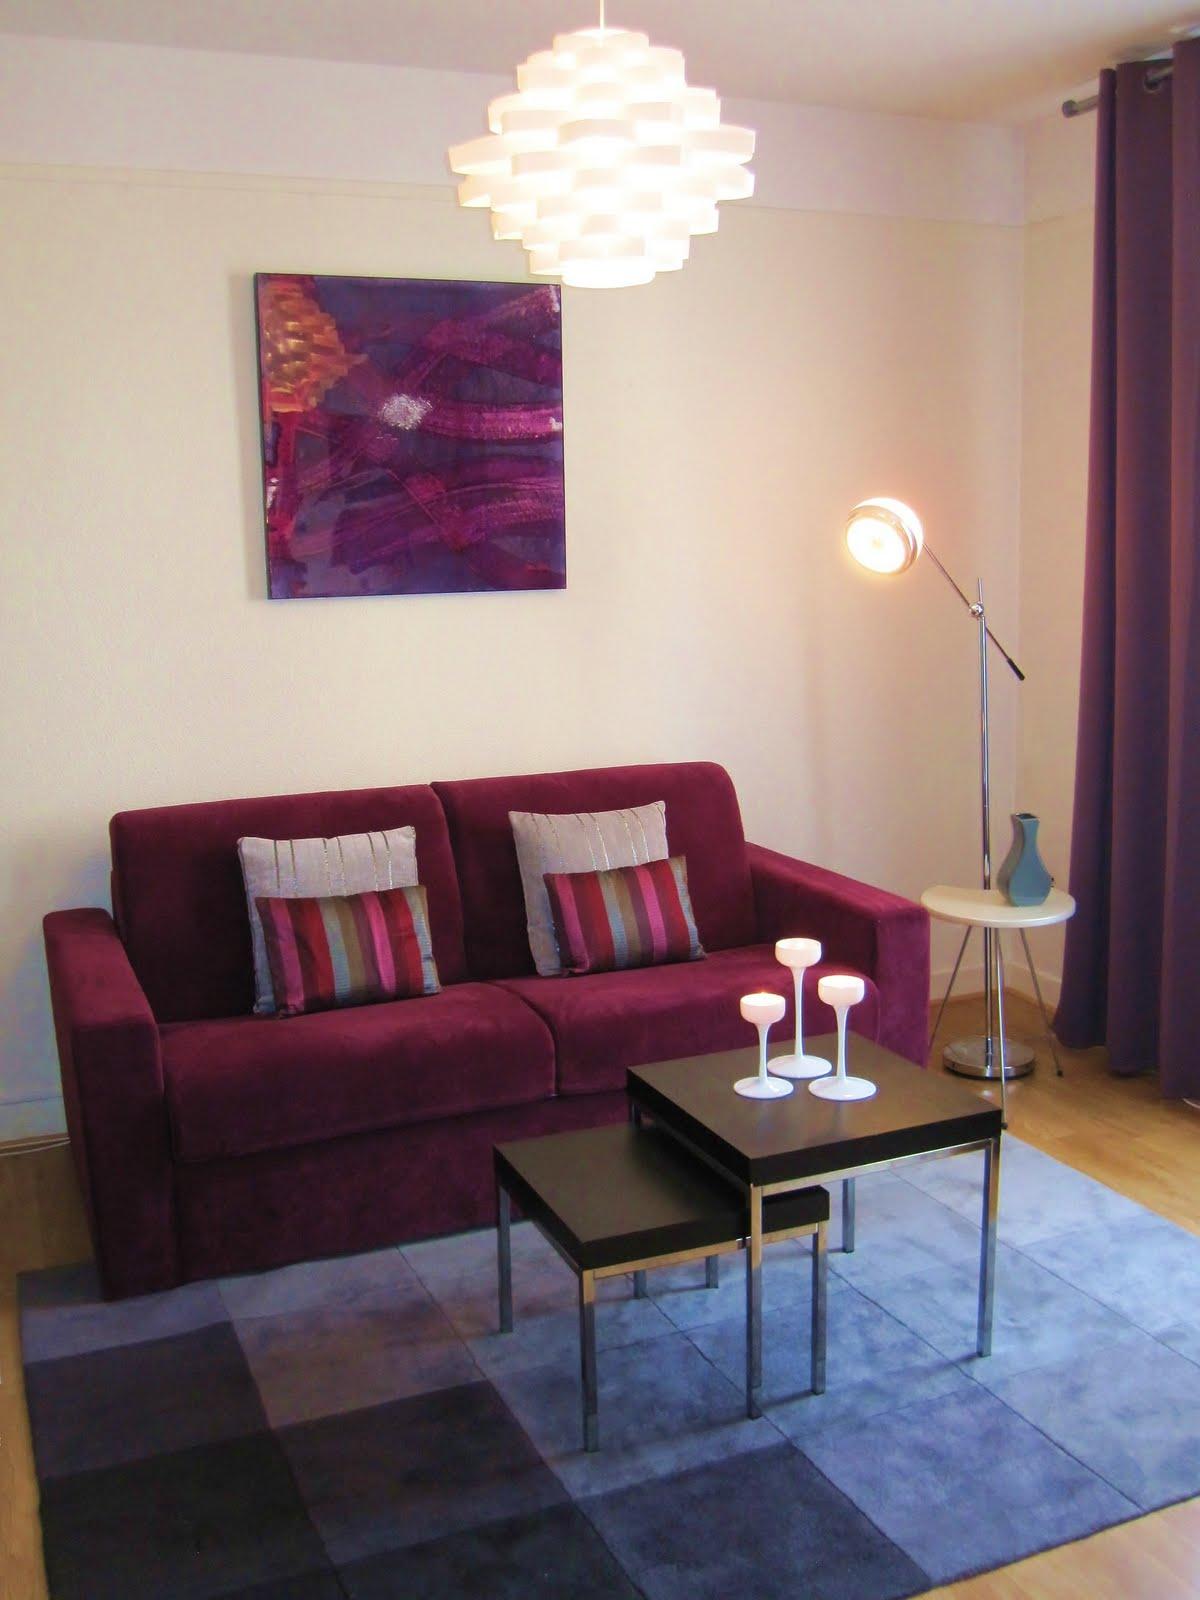 satine edition mobilier merchandising d co d 39 int rieur. Black Bedroom Furniture Sets. Home Design Ideas